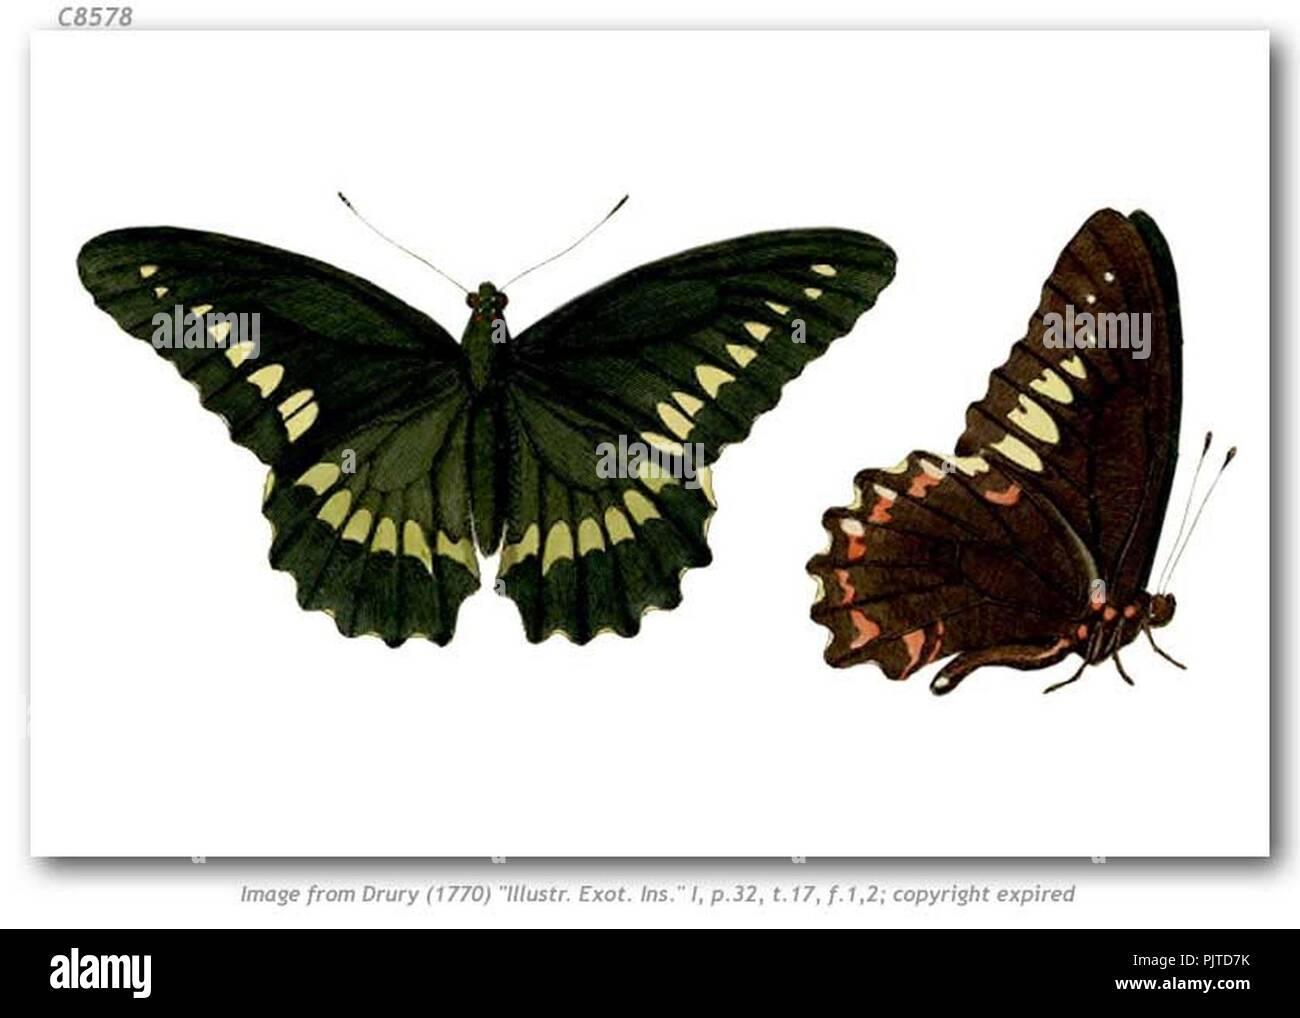 Battus polydamas antiquus 1. - Stock Image